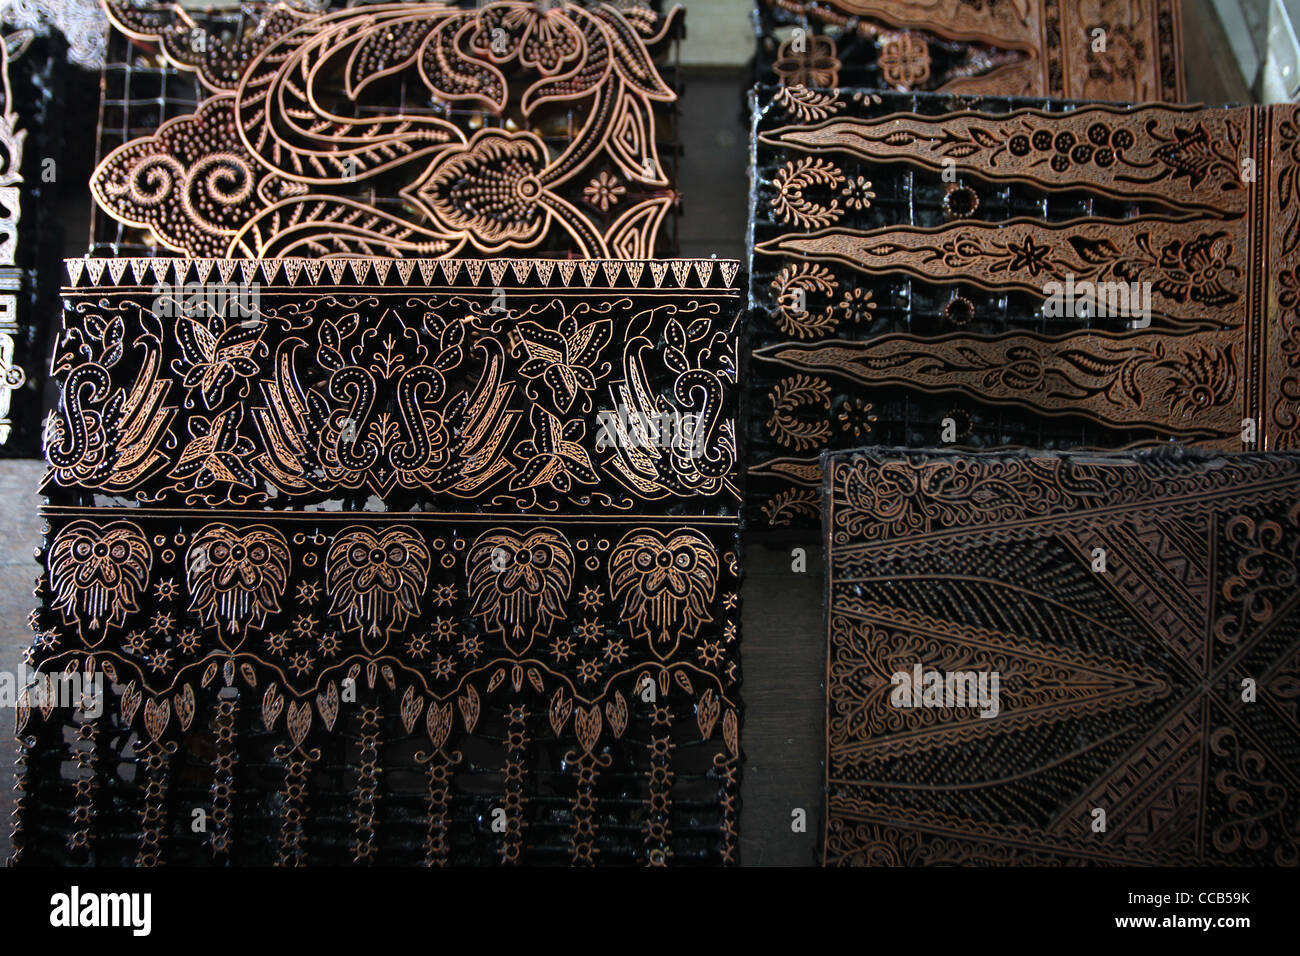 Batik Indonesia Stock Photos  Batik Indonesia Stock